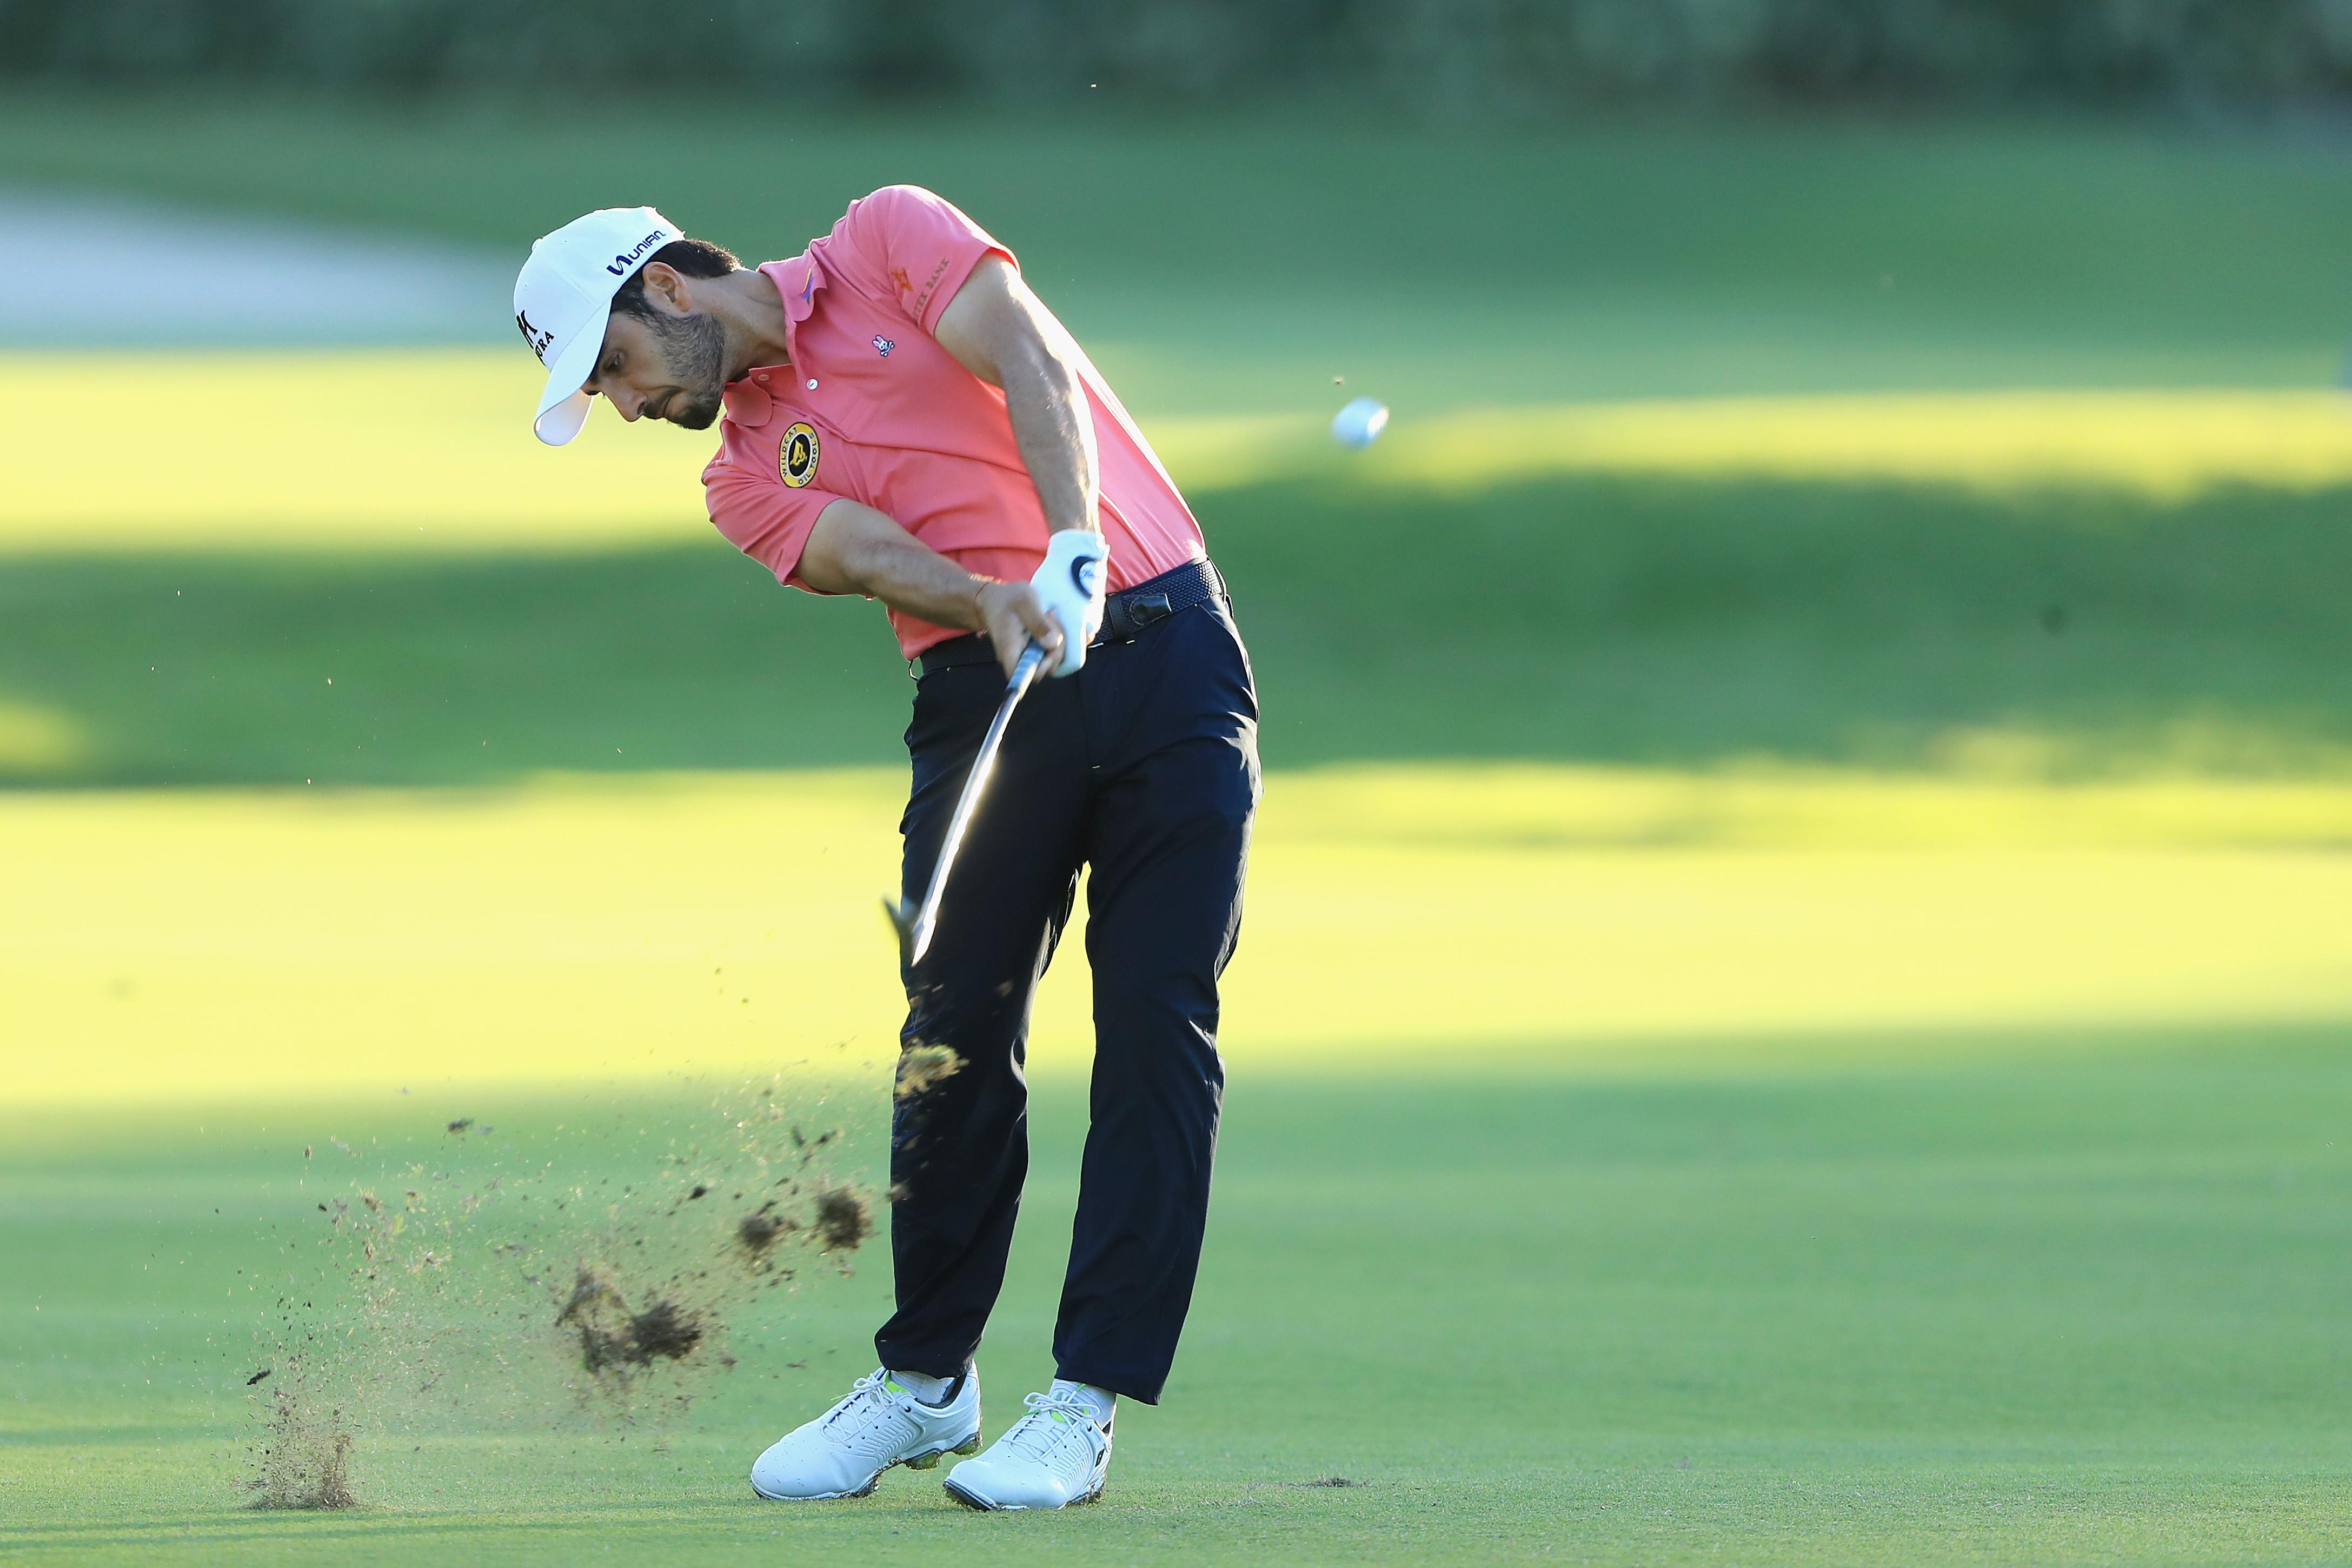 Miura Golf signs Abraham Ancer as its first PGA Tour